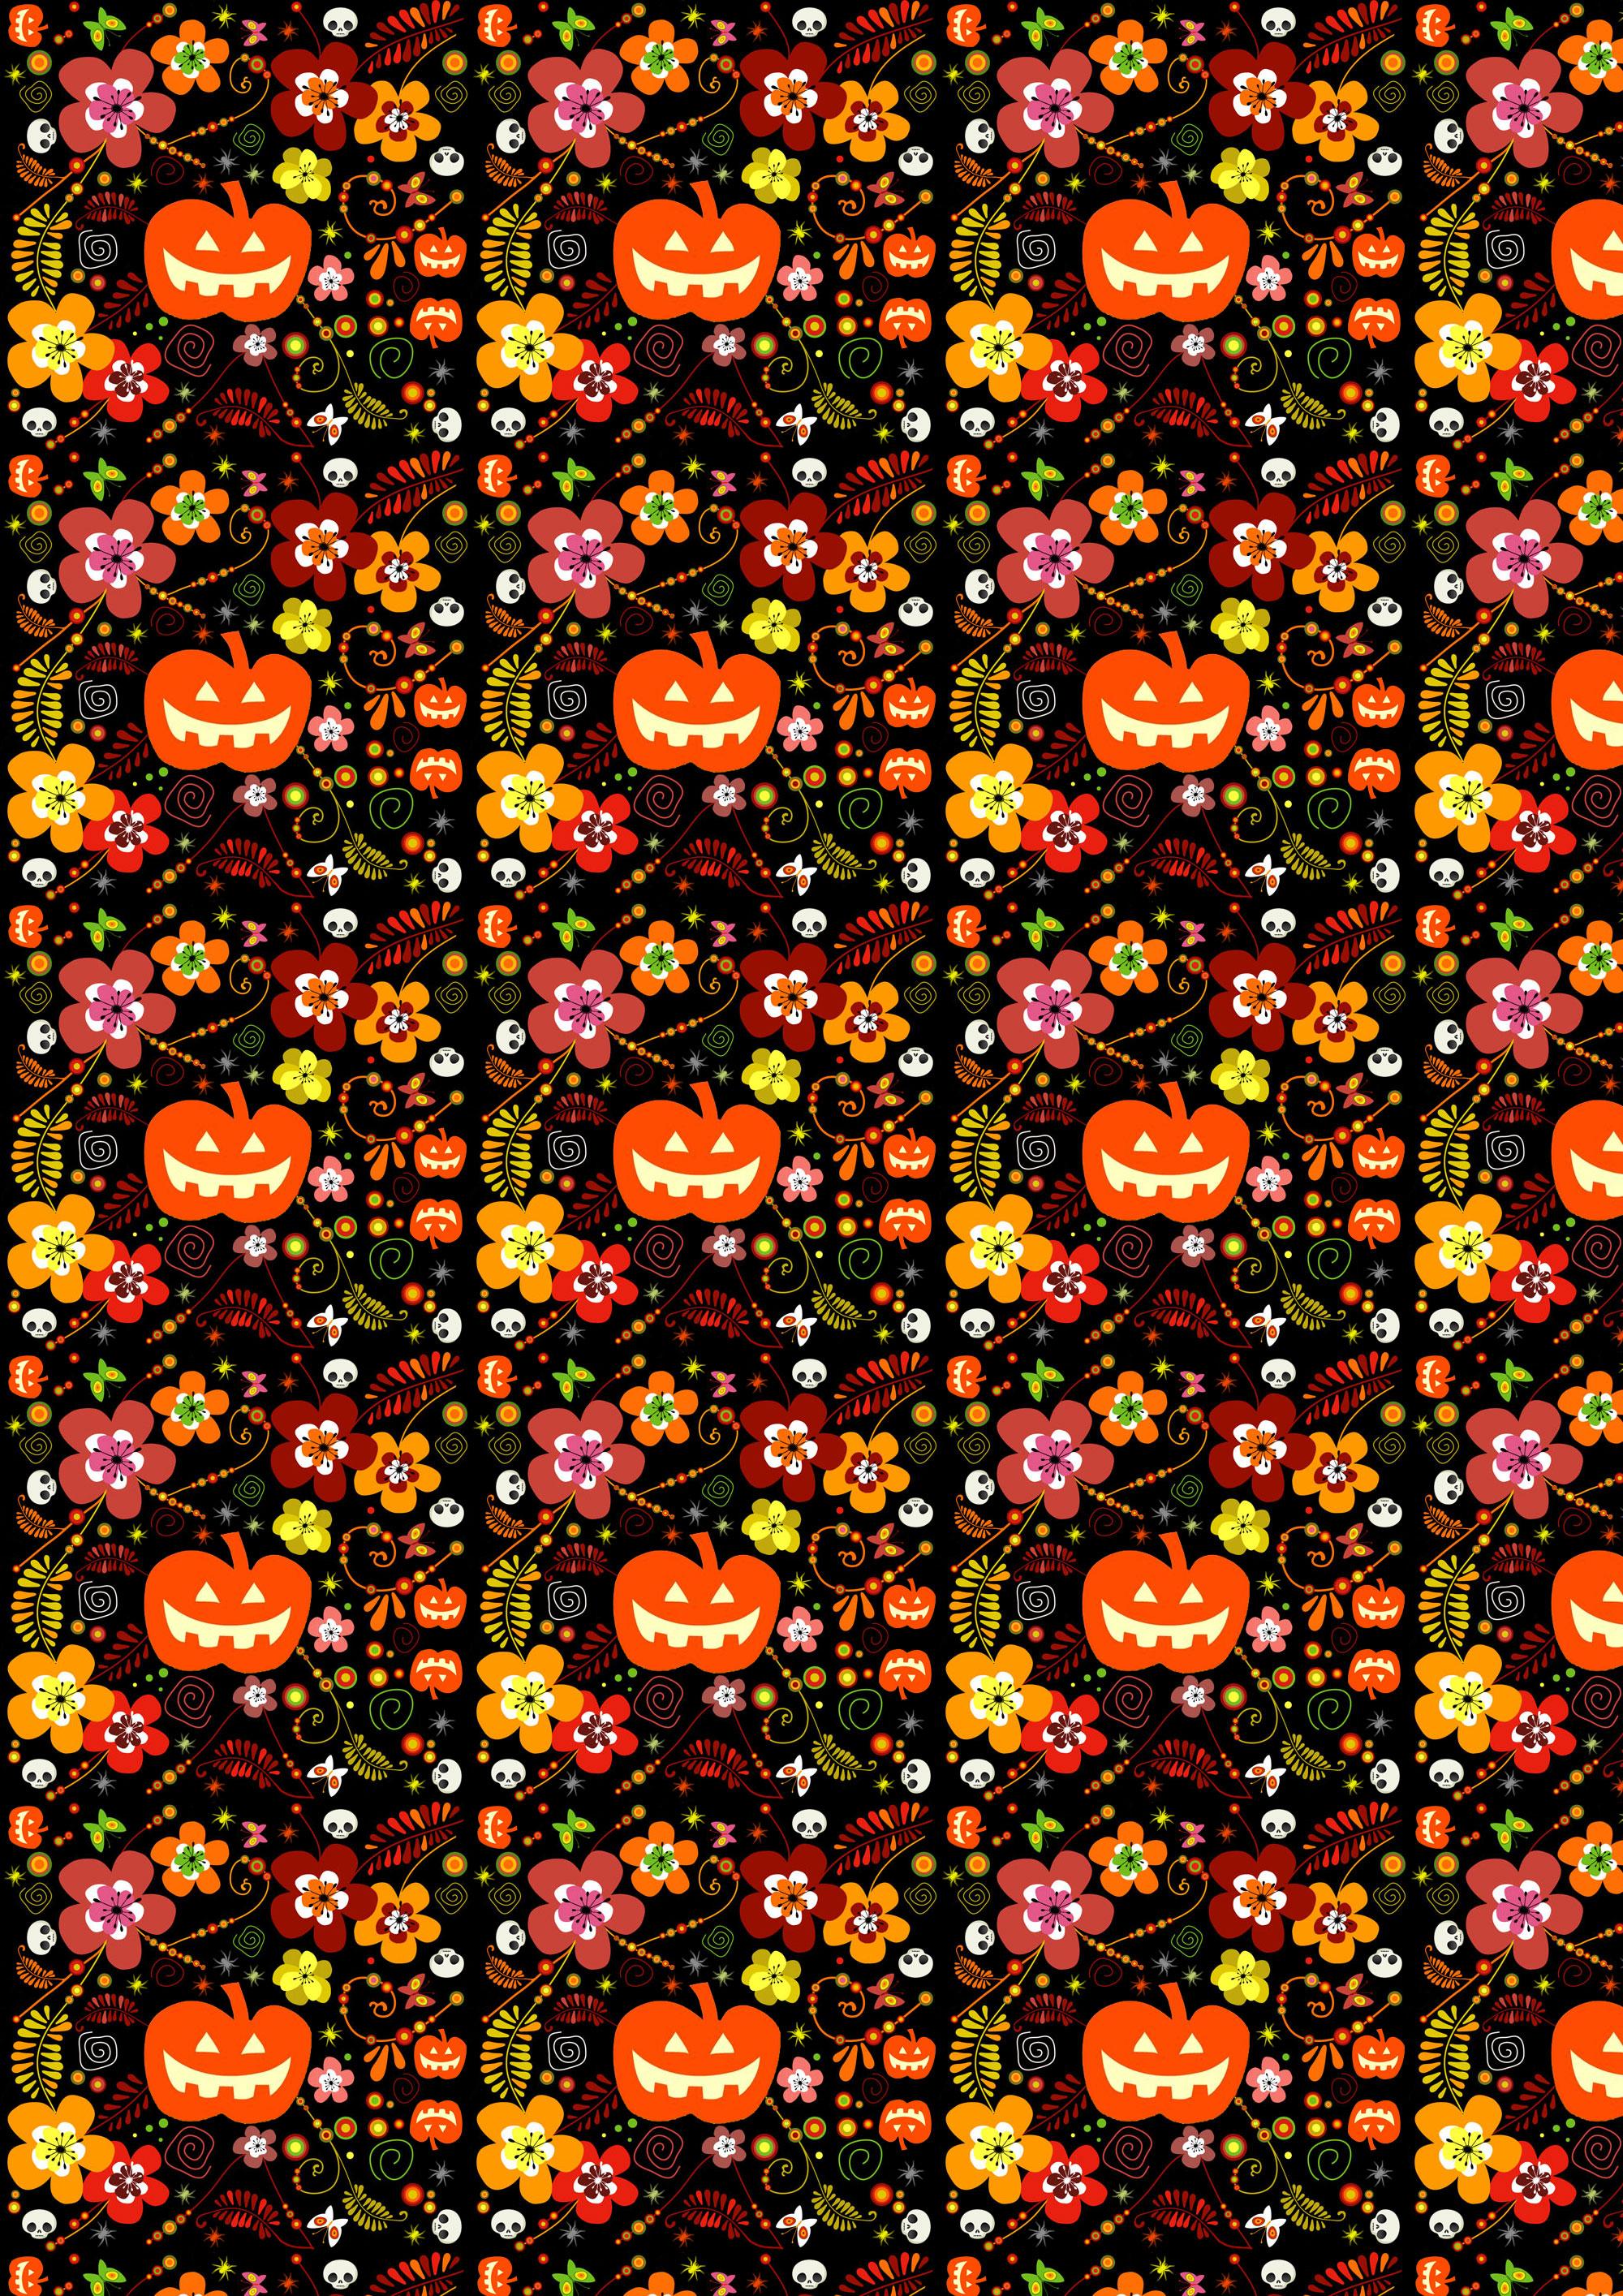 Free Scrapbook Paper Halloween Pumpkins And Flowers